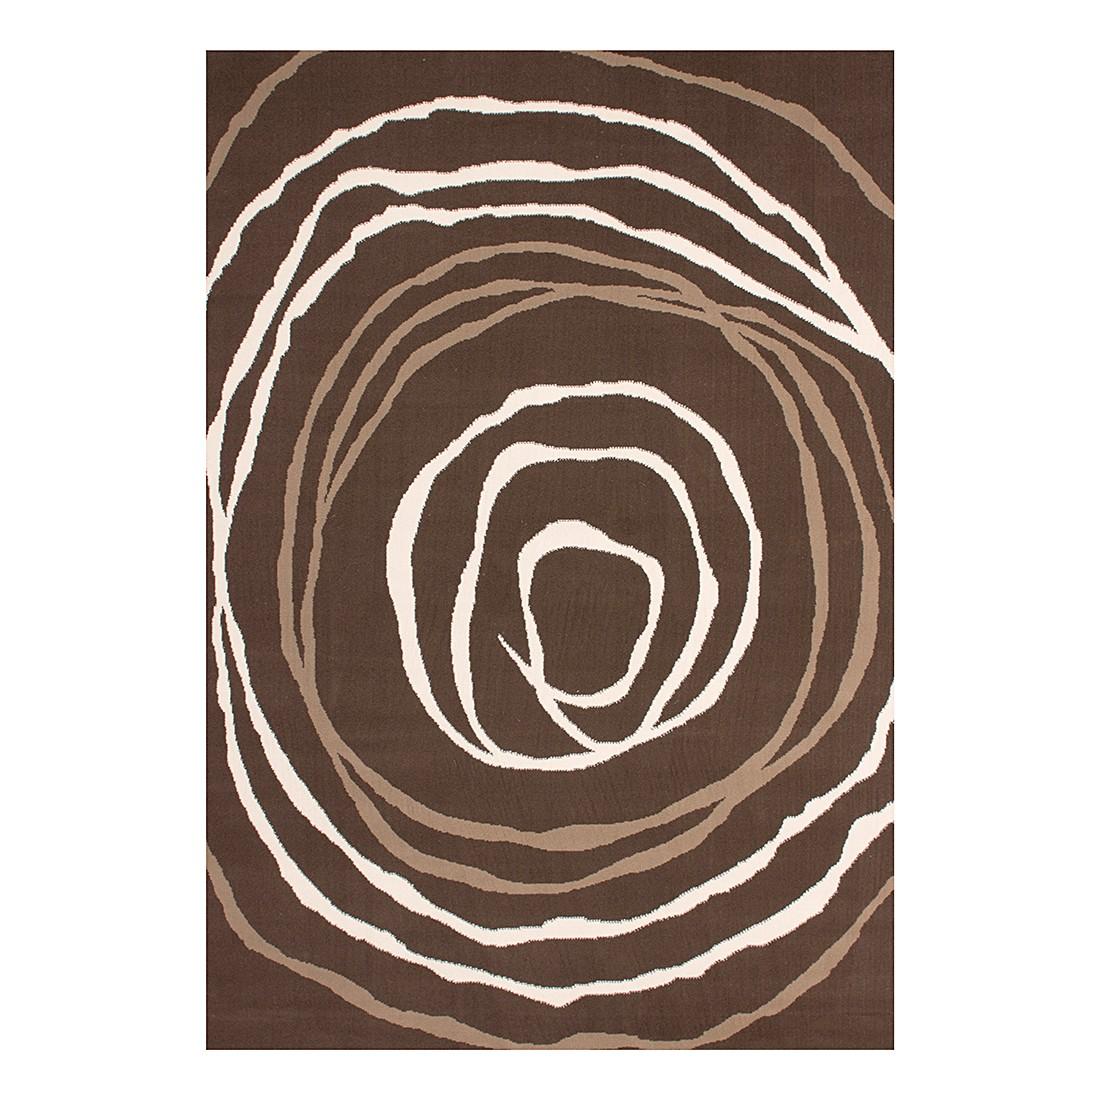 Teppich Funky II – Braun – 120 x 170 cm, Kayoom online kaufen